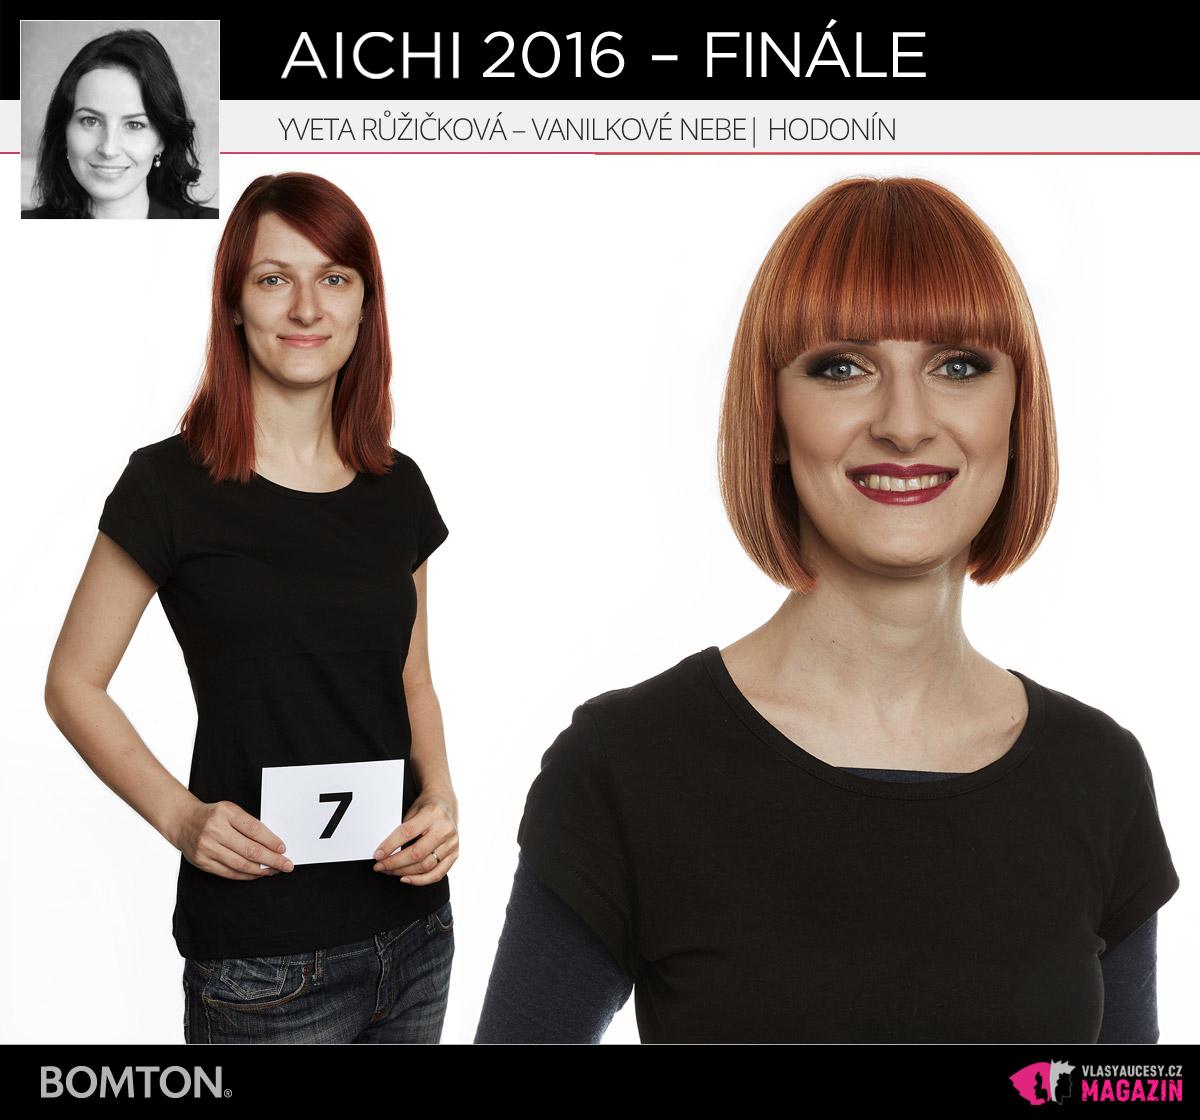 Semifinálová proměna AICHI 2016: Yveta Růžičková, Vanilkové Nebe, Hodonín